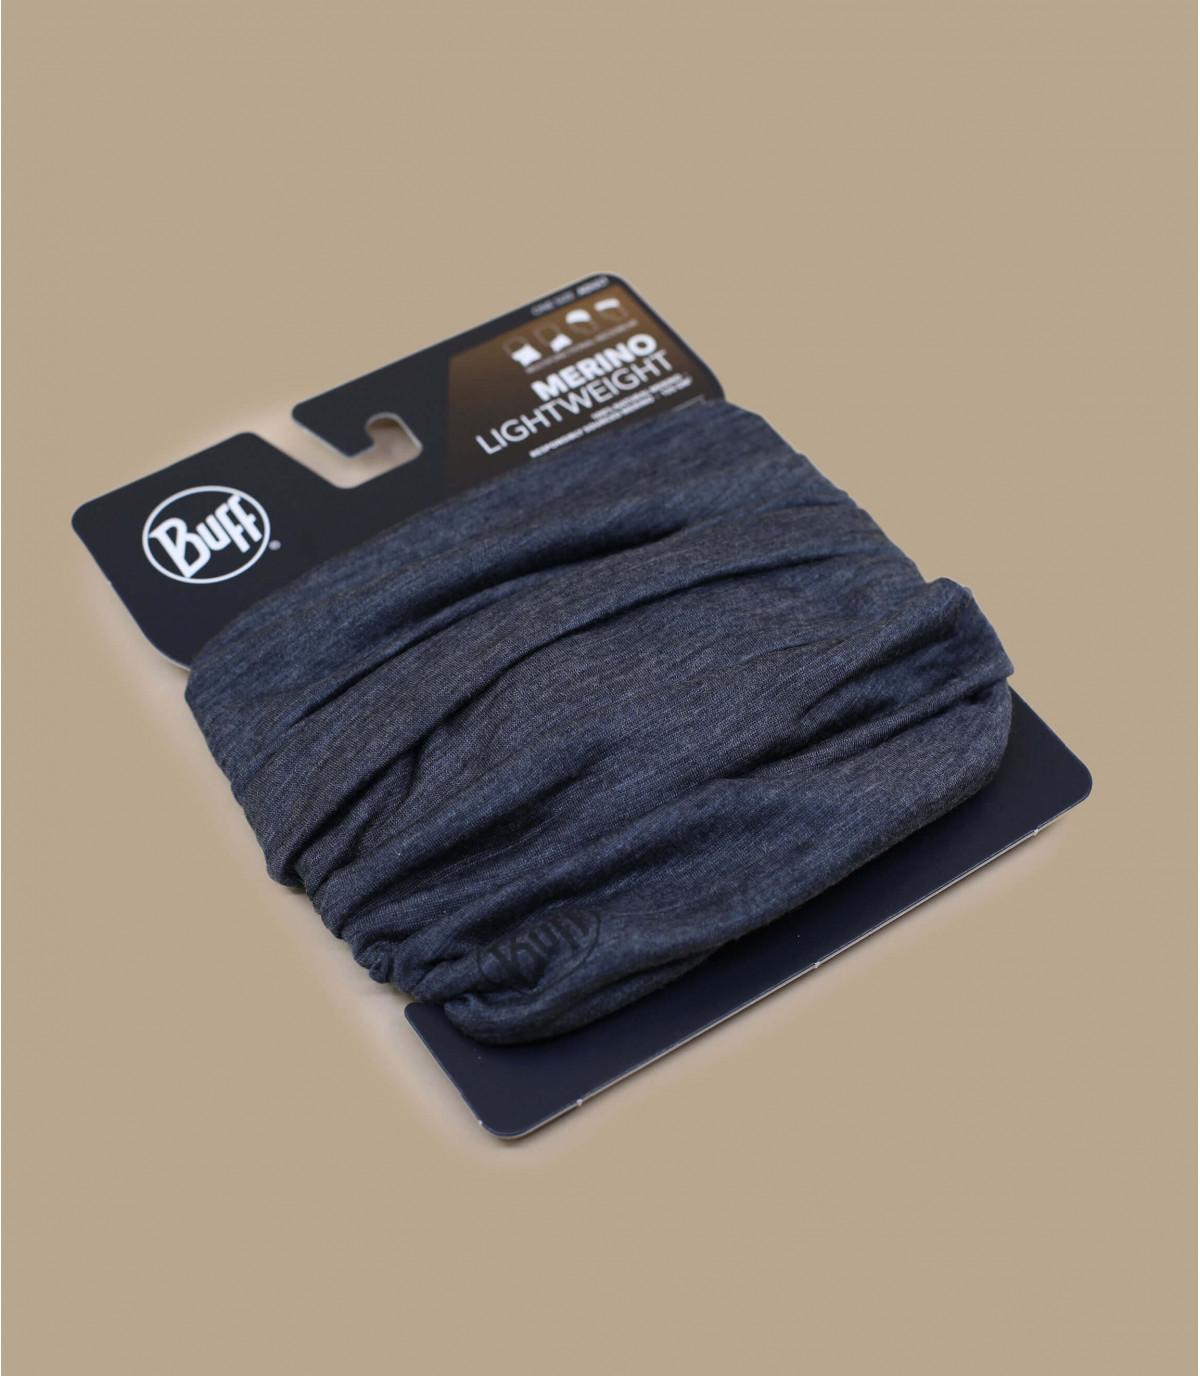 9eab09eb2e Buff lana gris lightweight merino wool solid grey de buff headict jpg  758x470 Solid grey